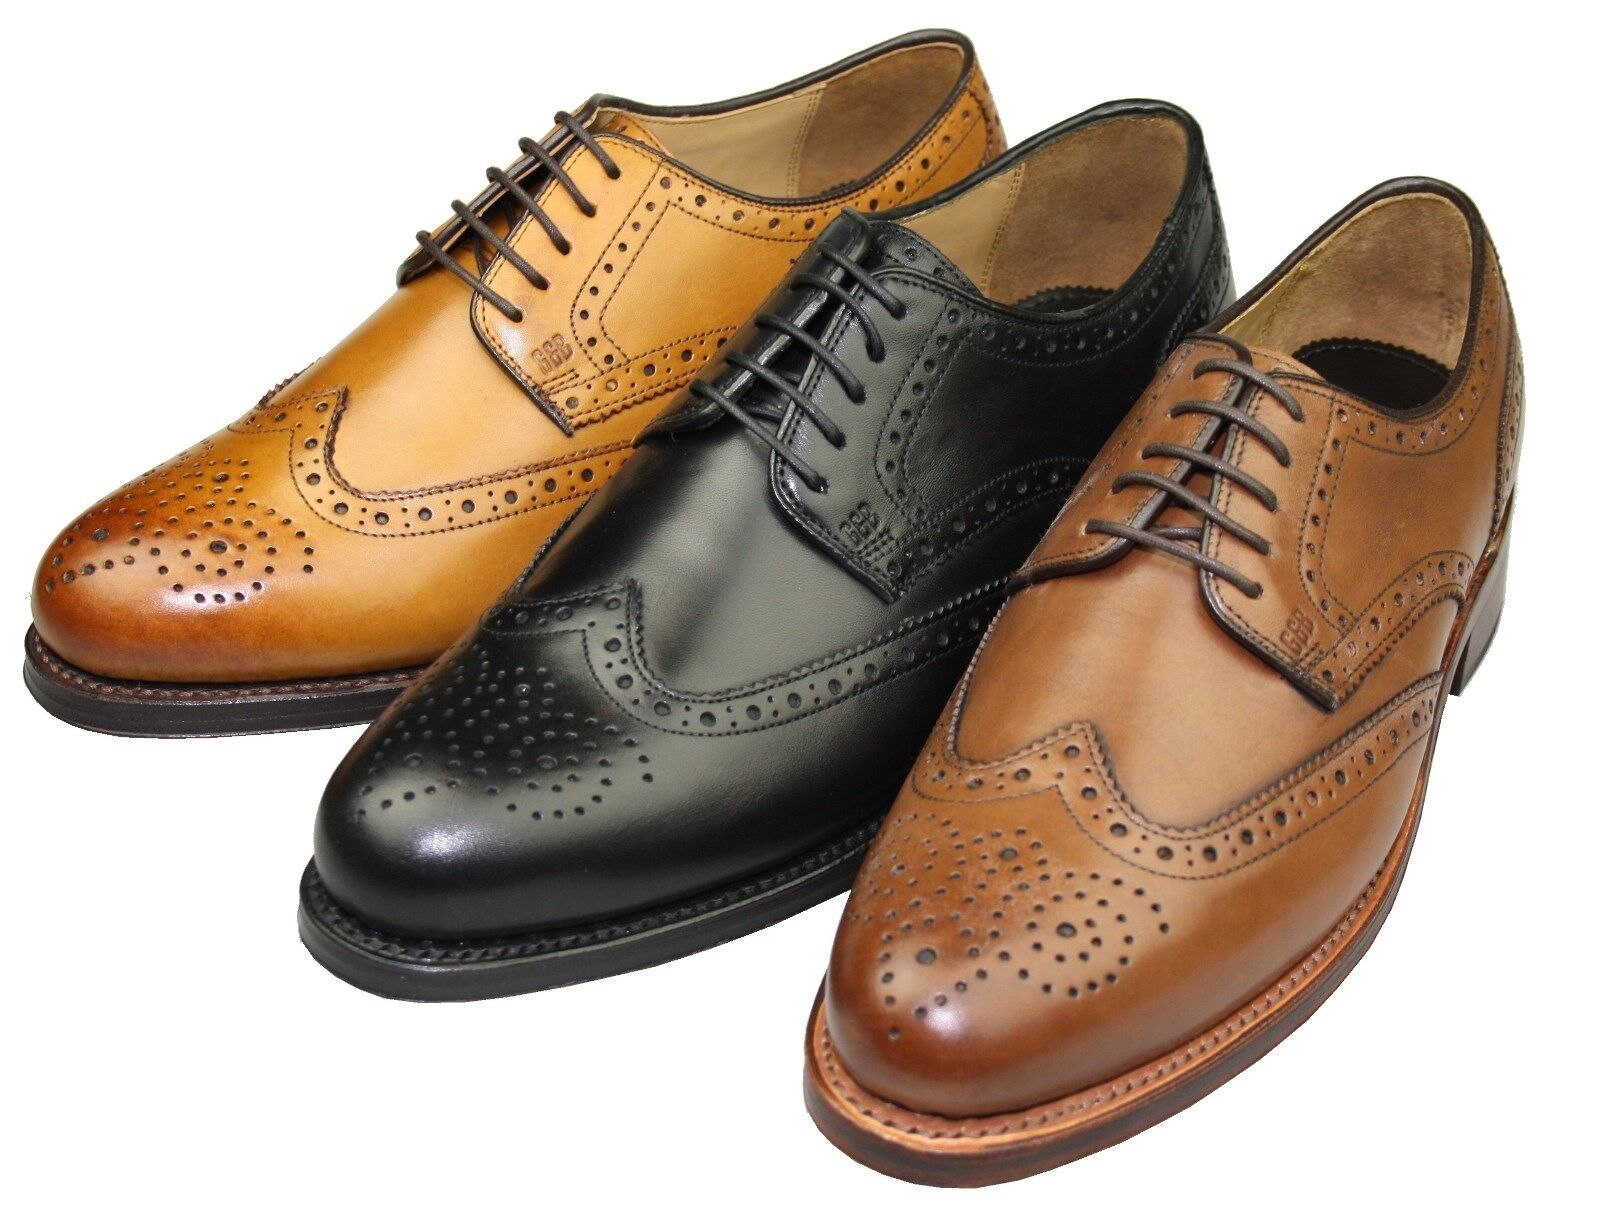 Gordon & Bros. 2318 Levet rahmengenähte Schuhe, Goodyear Welted, Budapester